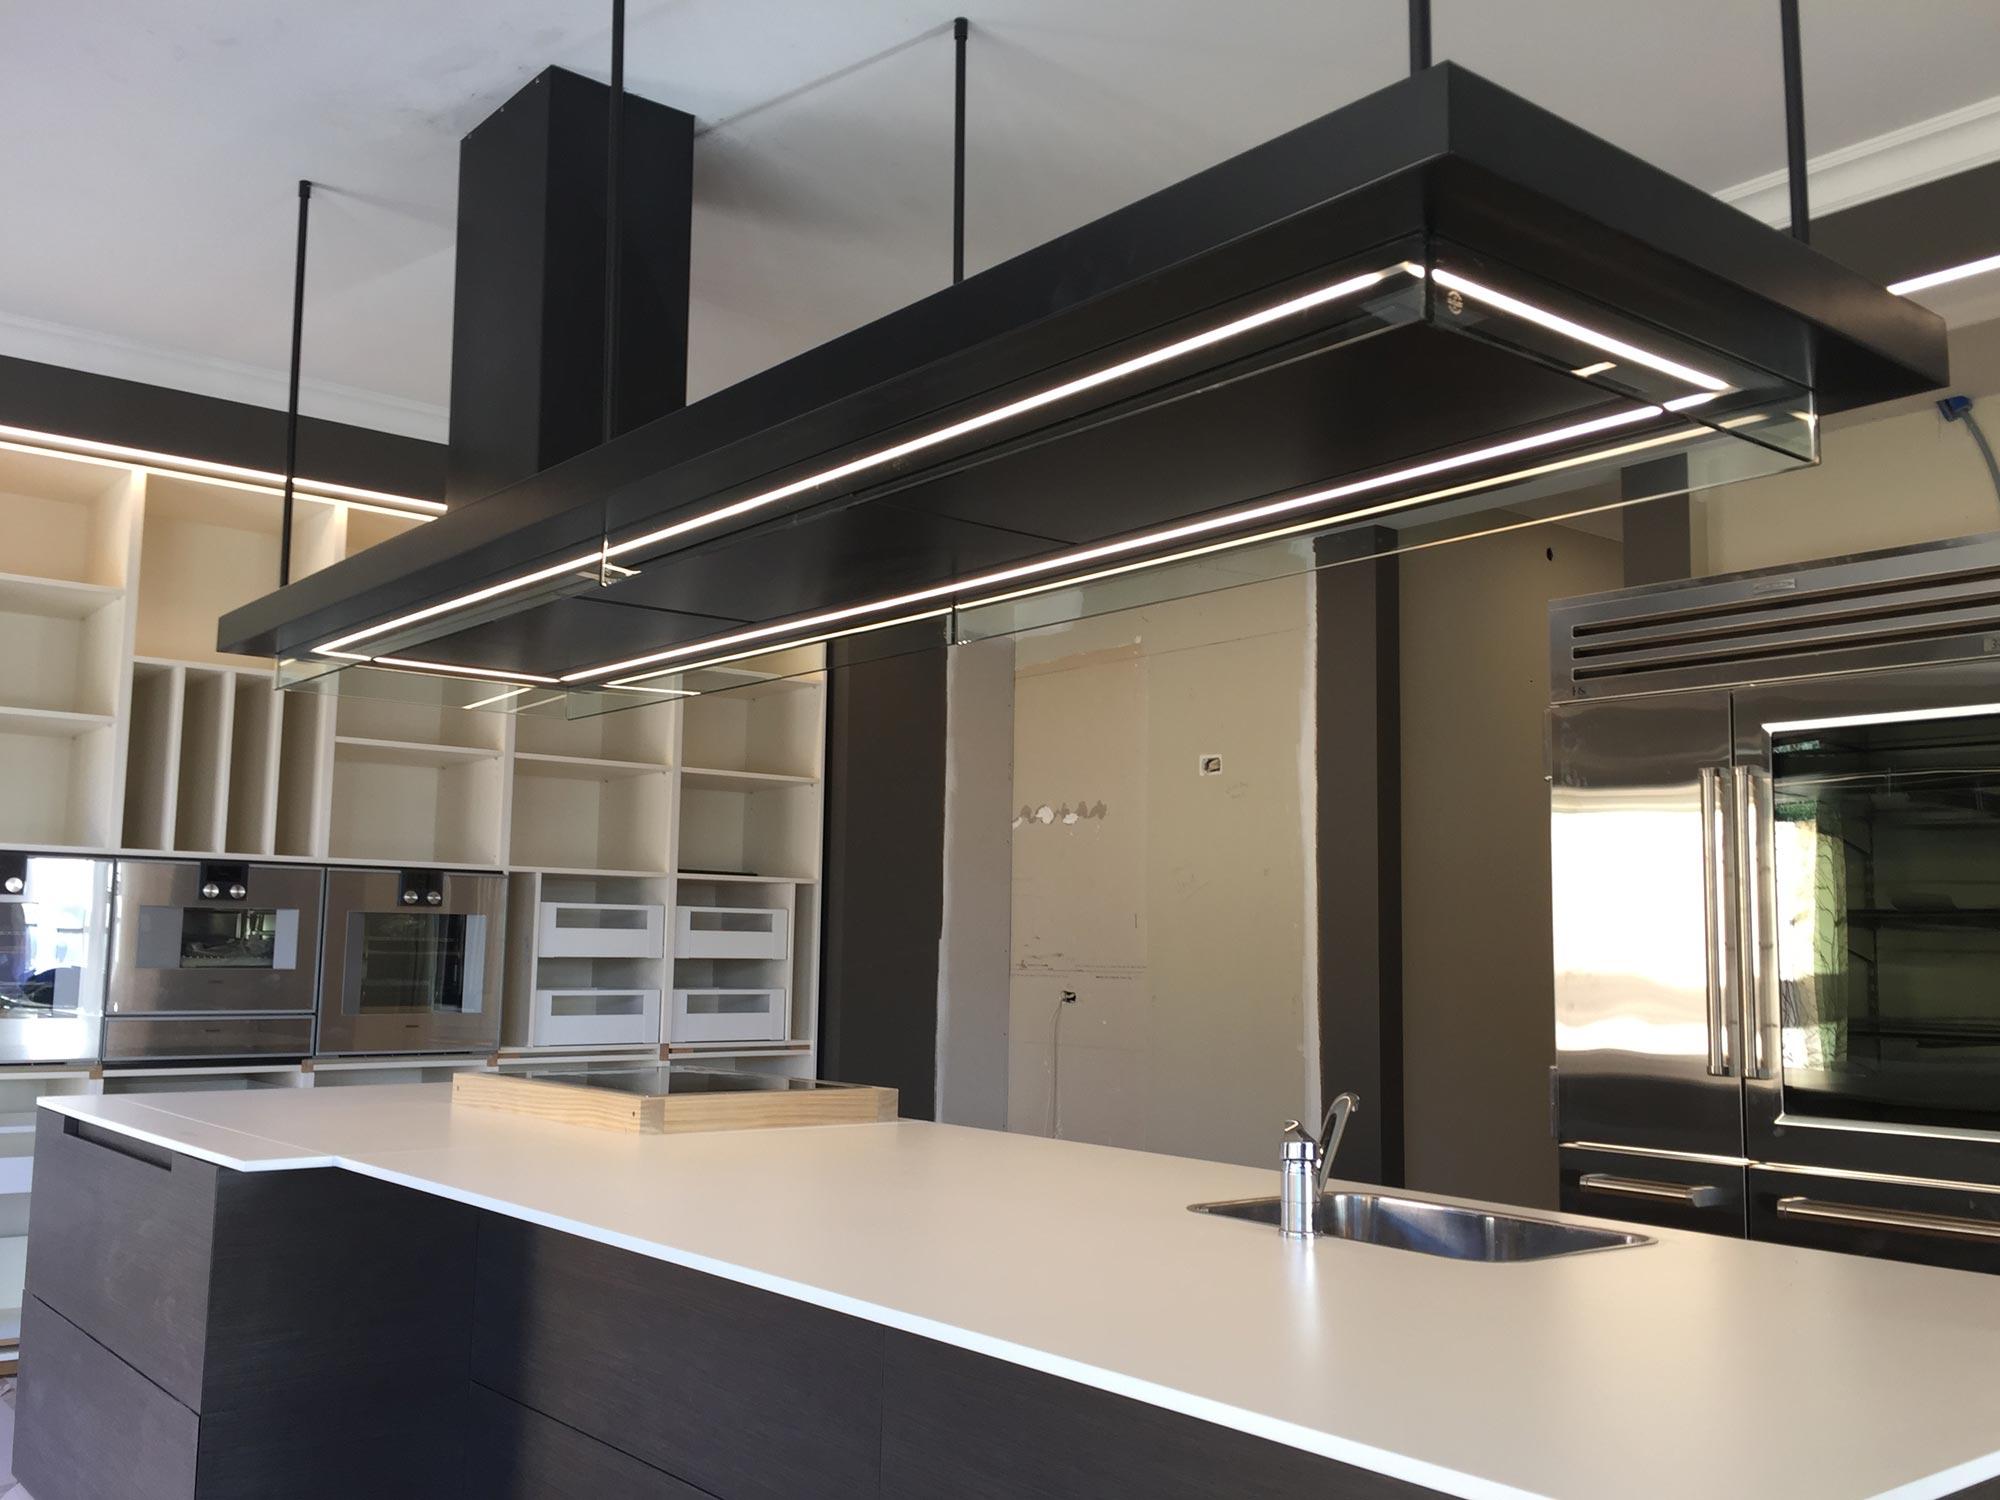 architectural range hoods domestic